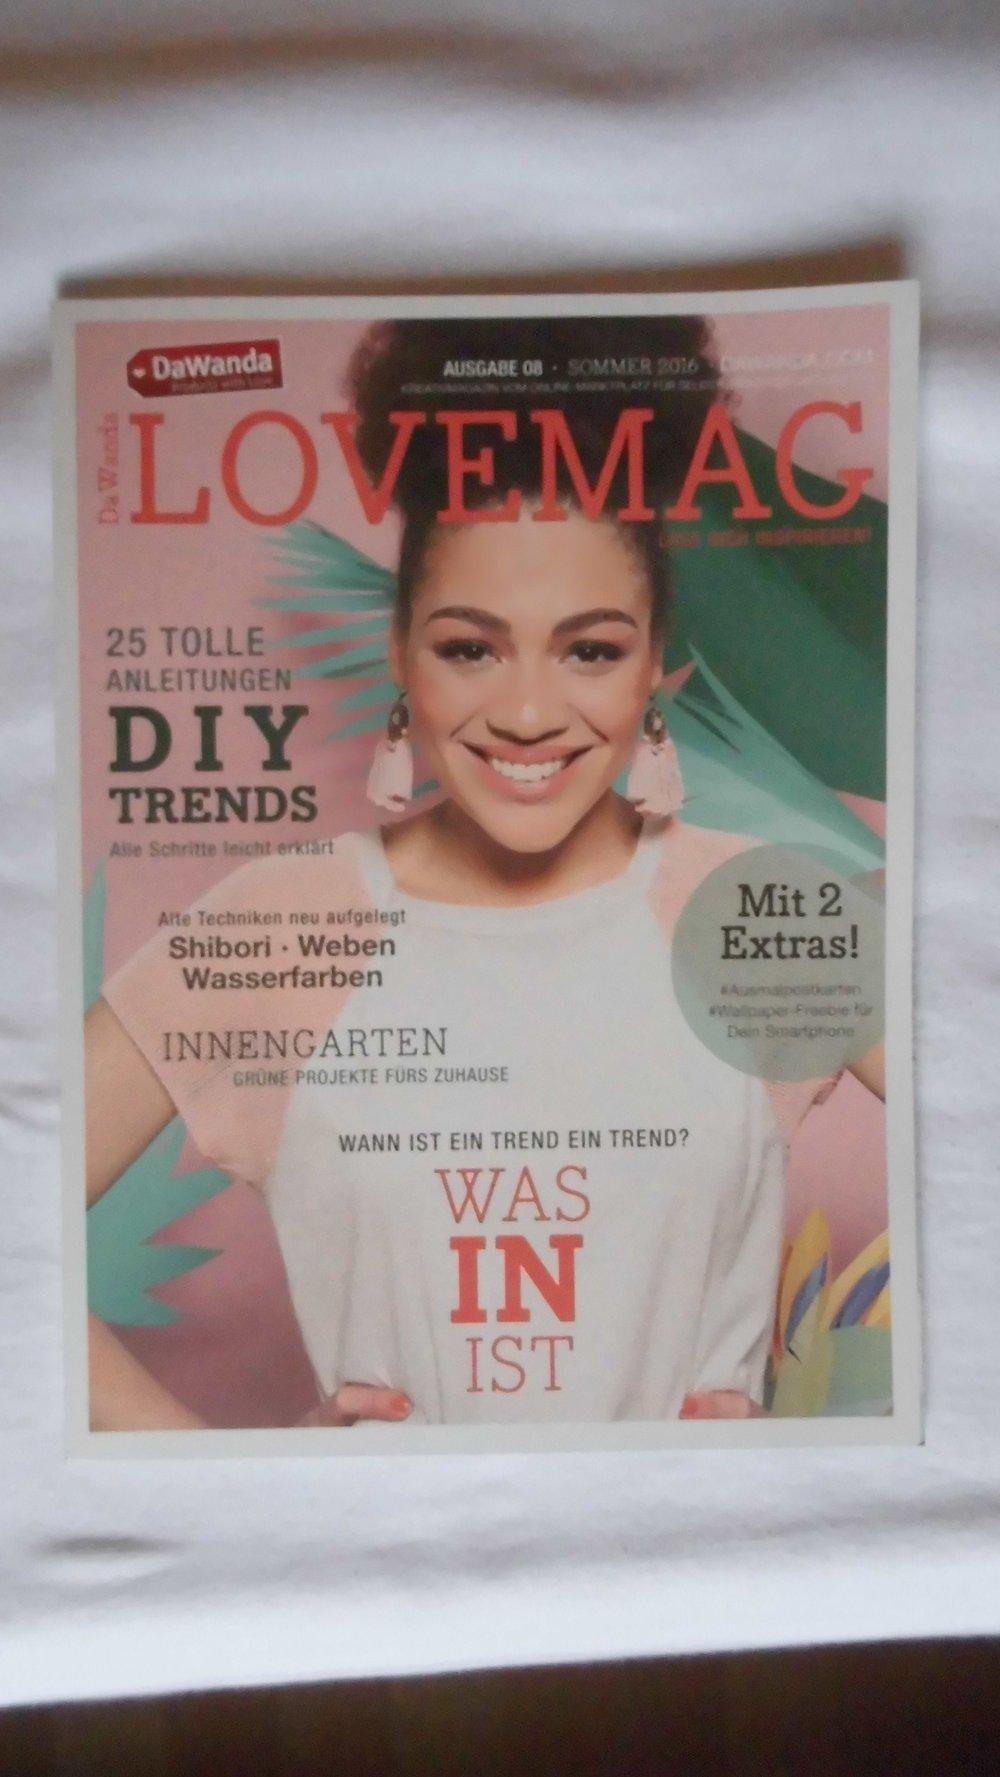 lovemag diy zeitschrift 08/2016 :: kleiderkorb.de